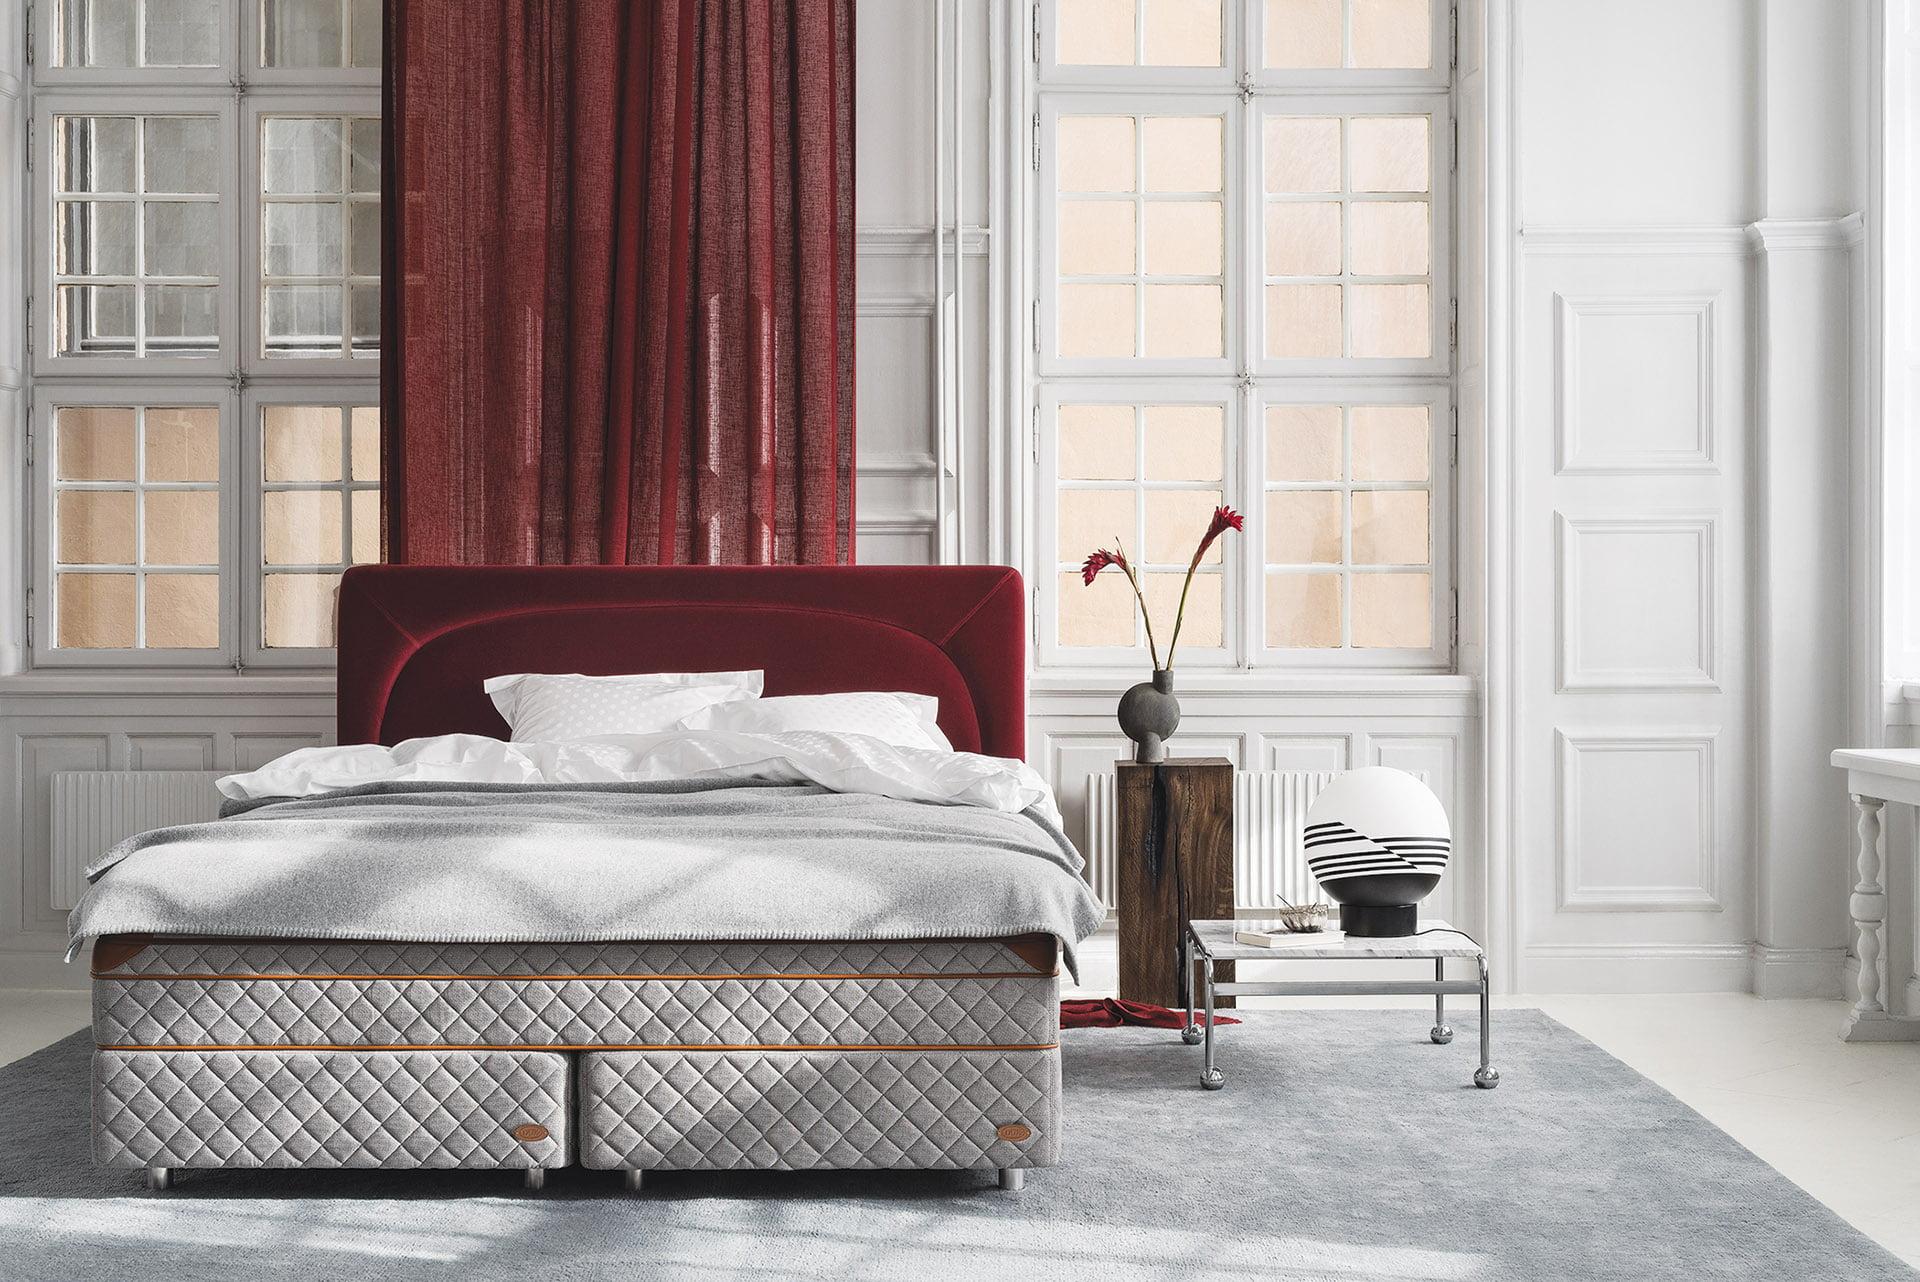 Duxiana Dux 6006 mattress